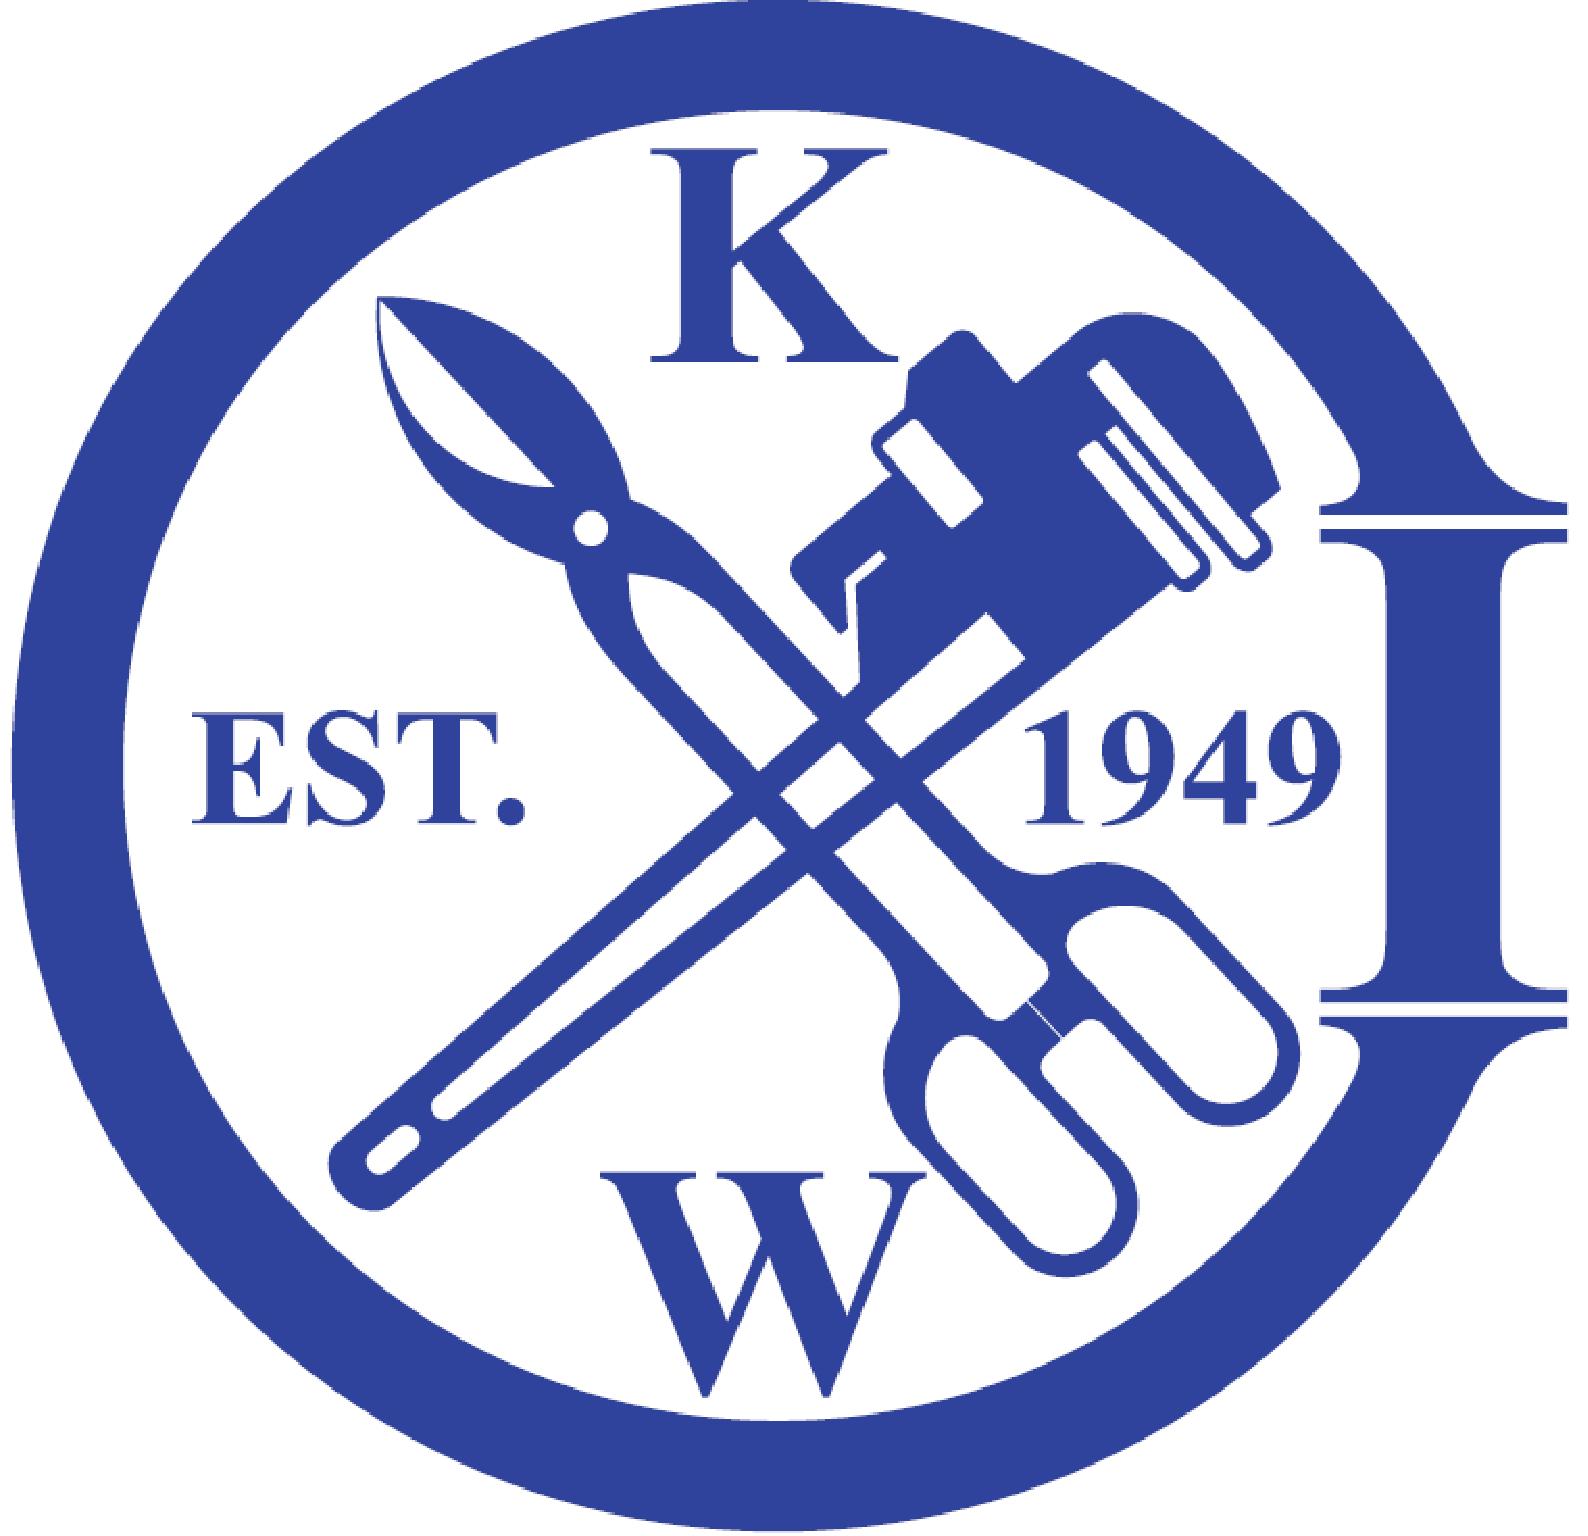 Kirk Williams Company